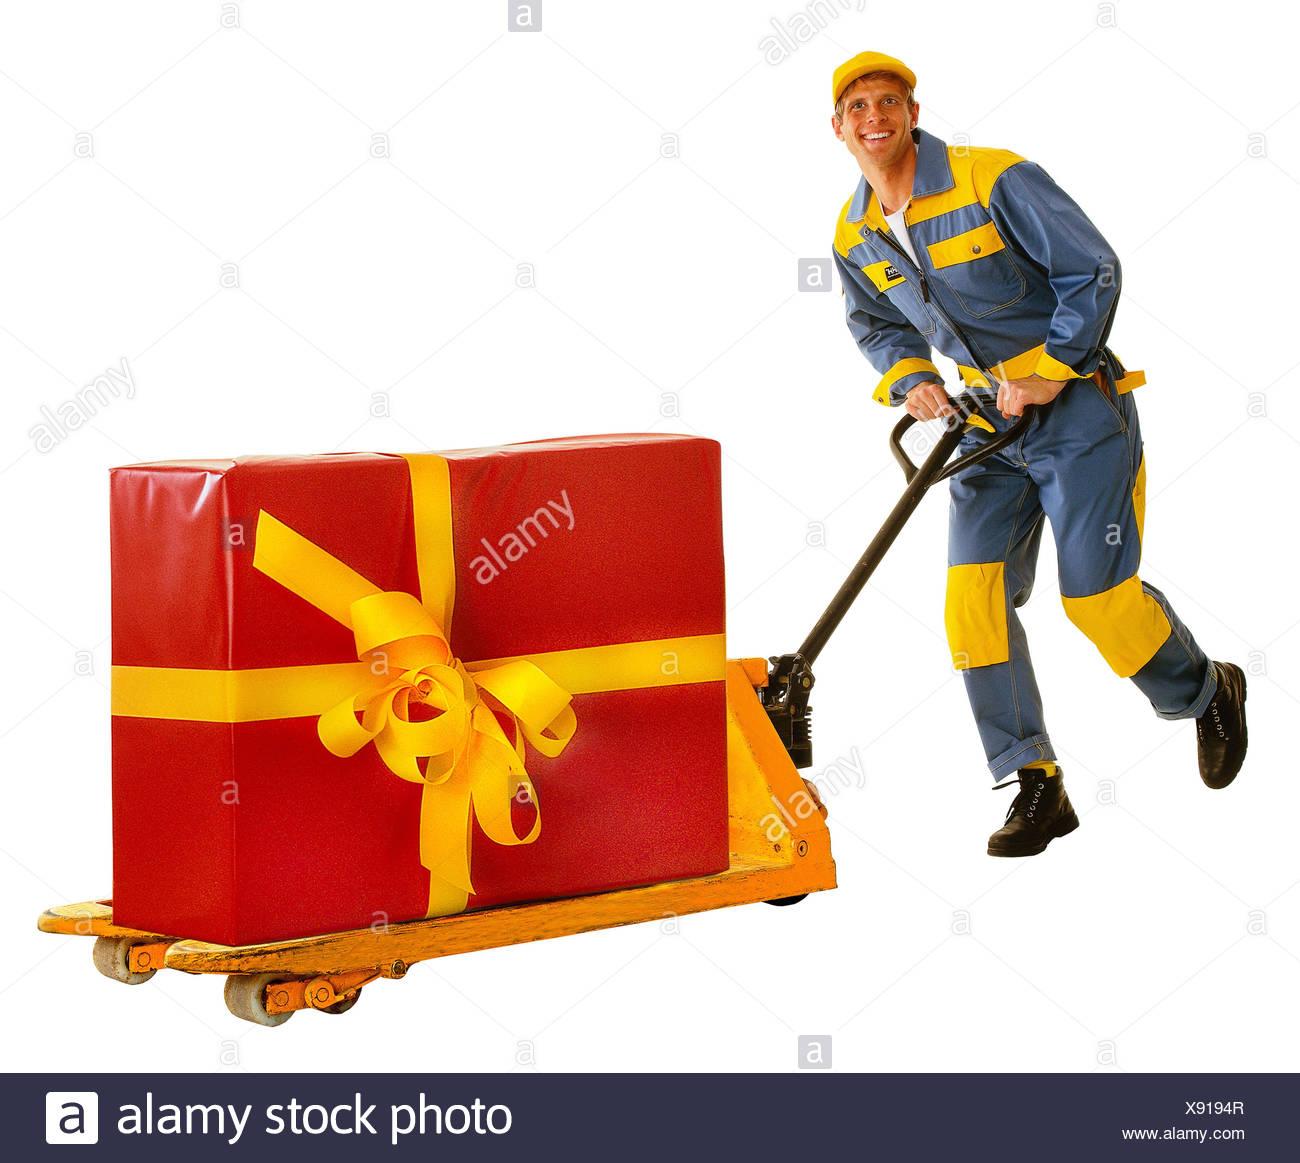 Messenger, elevating platform trucks, present, block, run, professions, man, occupation, parcel deliver, package delivery, package, studio, cut out, - Stock Image